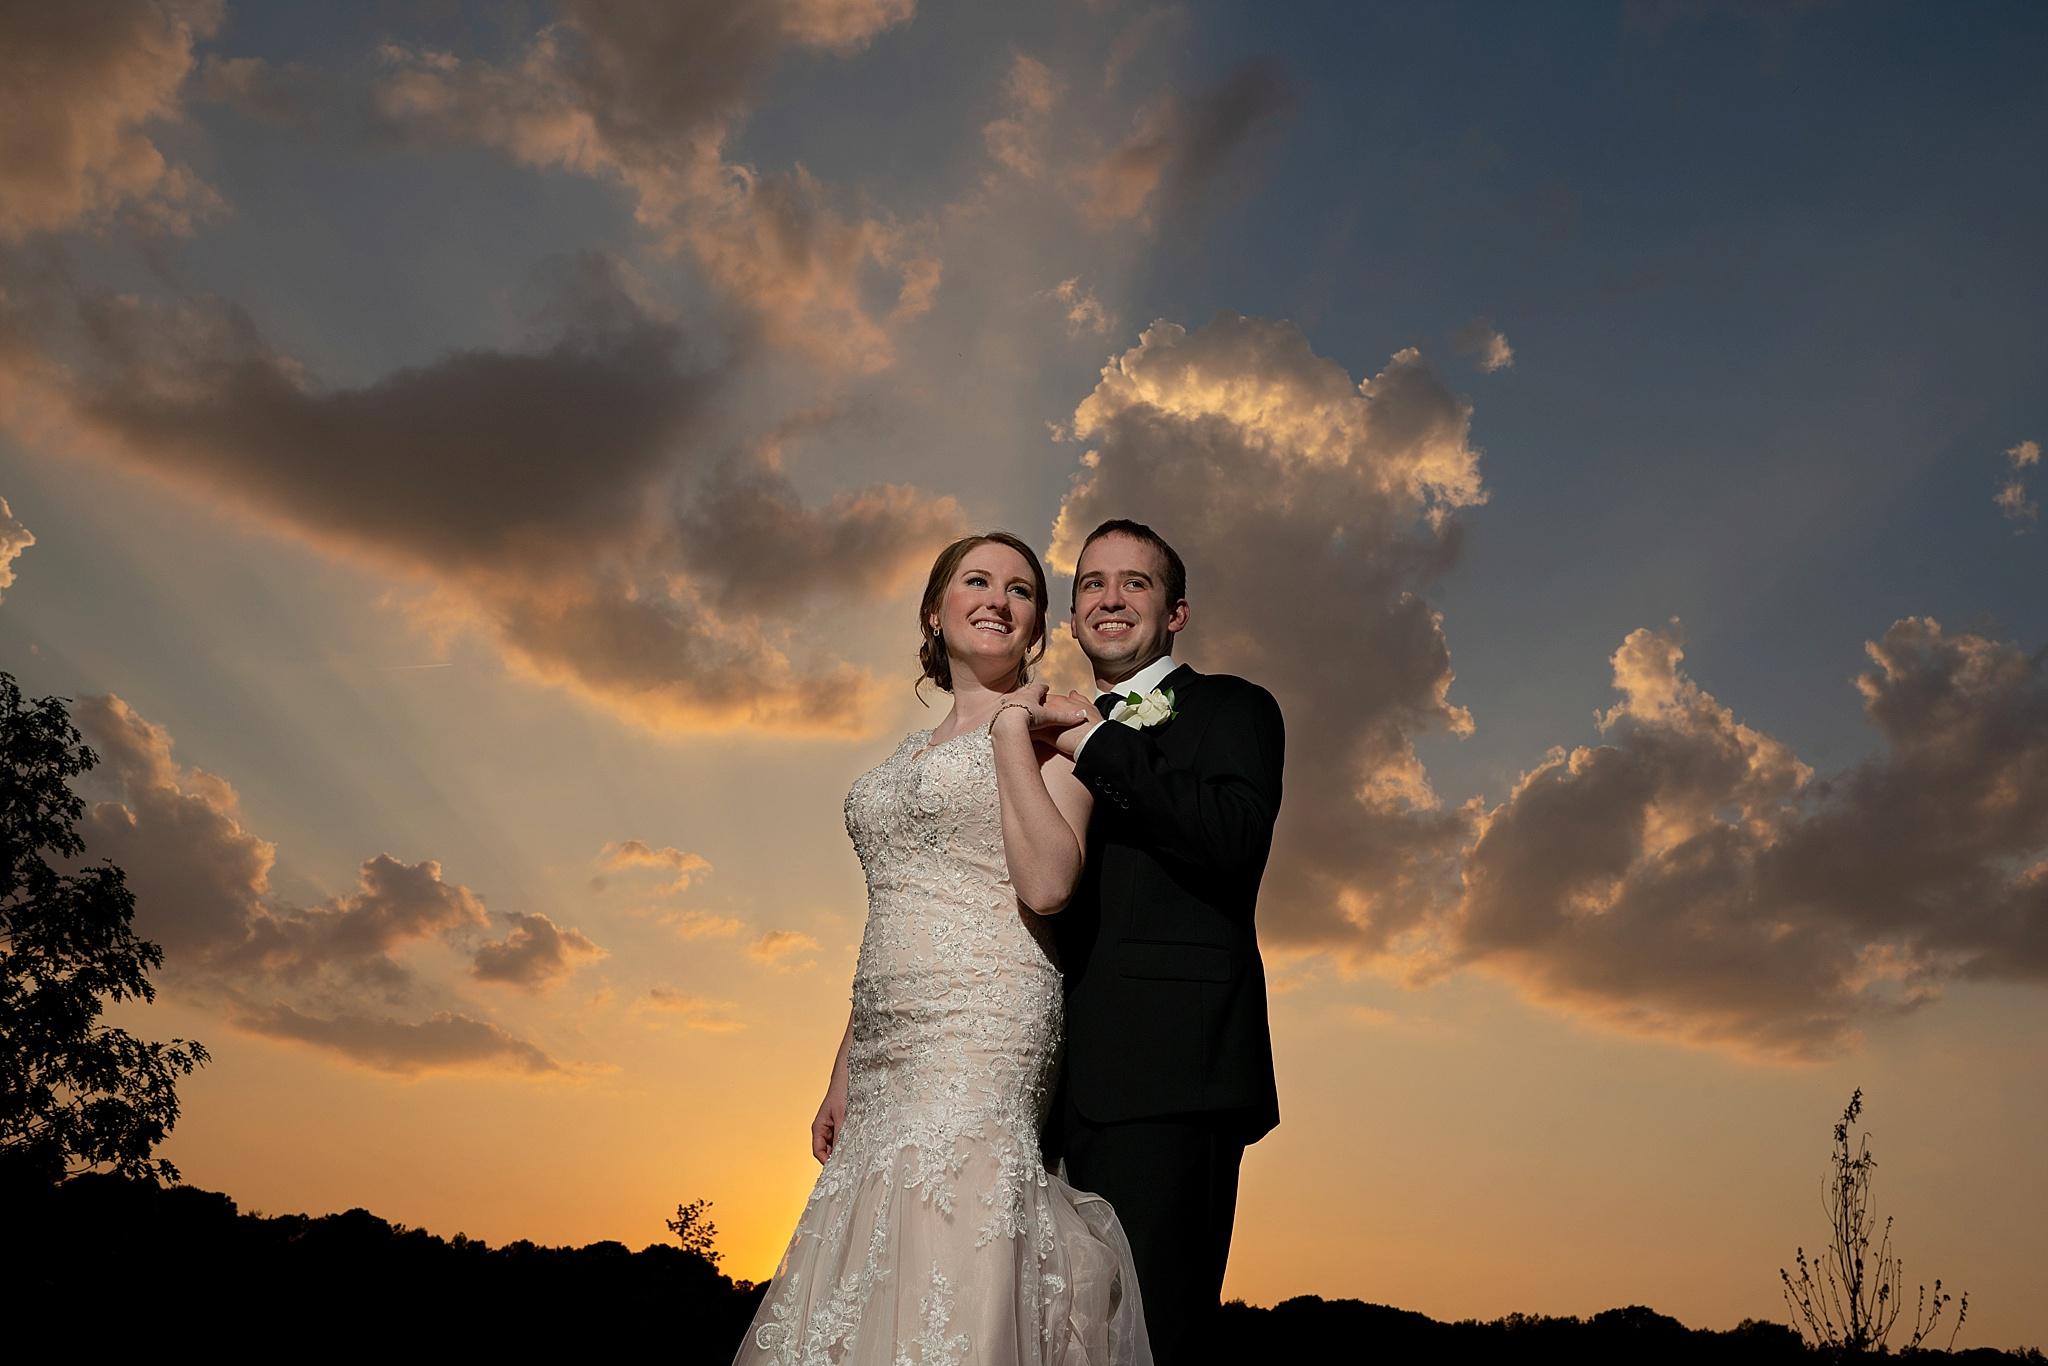 Pavilion-Carriage-Farms-Wedding-Photographer-228.jpg